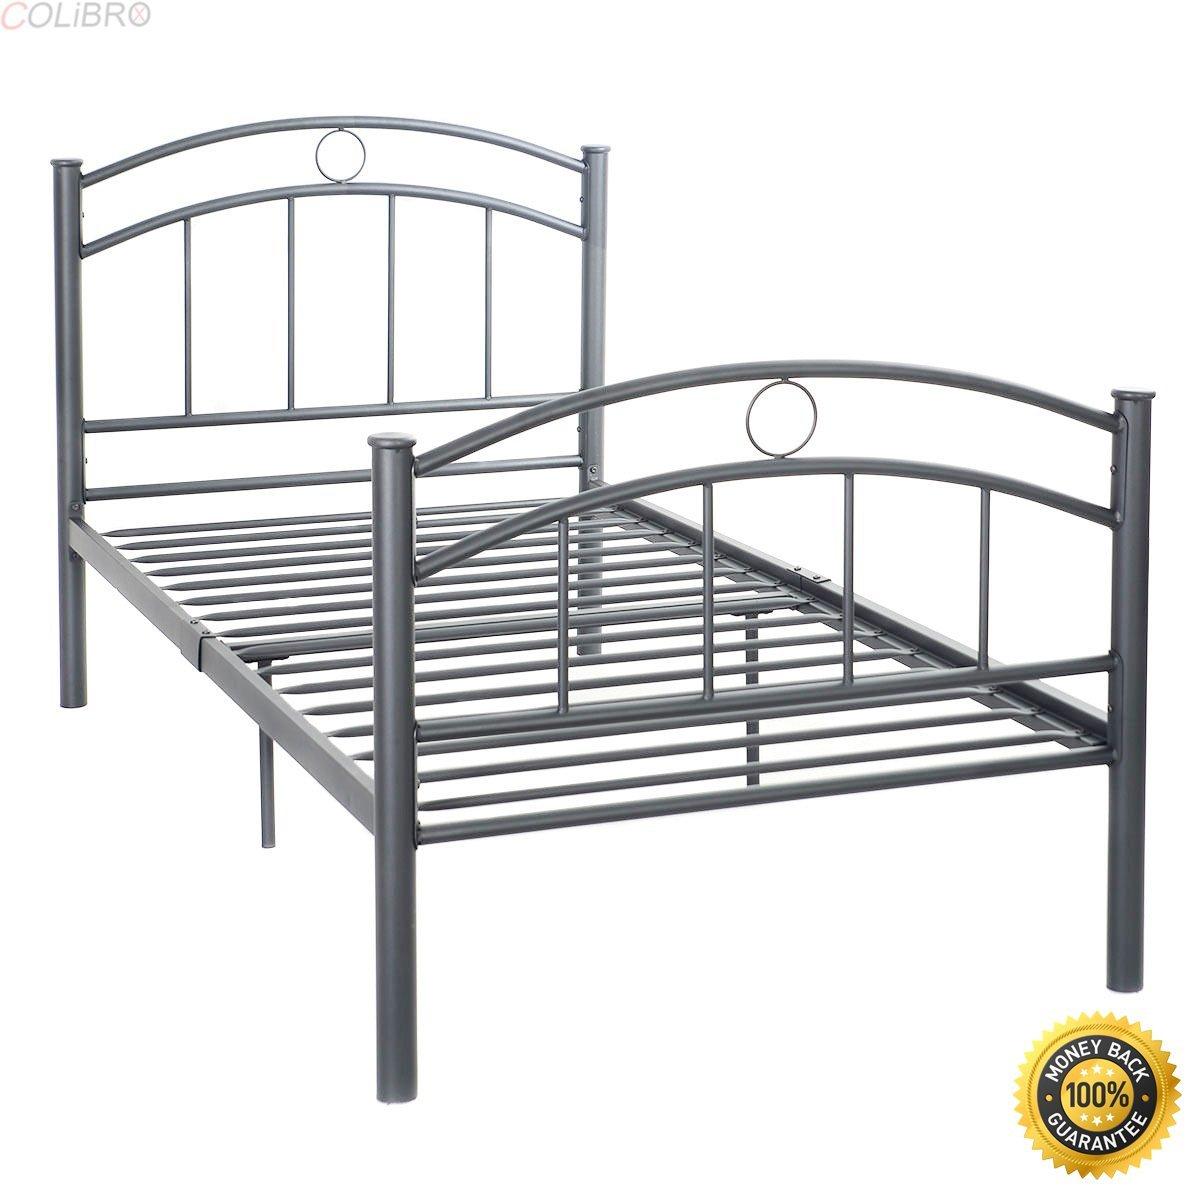 "COLIBROX--83""x42""x35"" Black Metal Bed Frame Platform Twin Size Bedroom Home Furniture New,metal bed frame queen,queen metal bed frame,Black Steel Bed Frame,bed frames full"